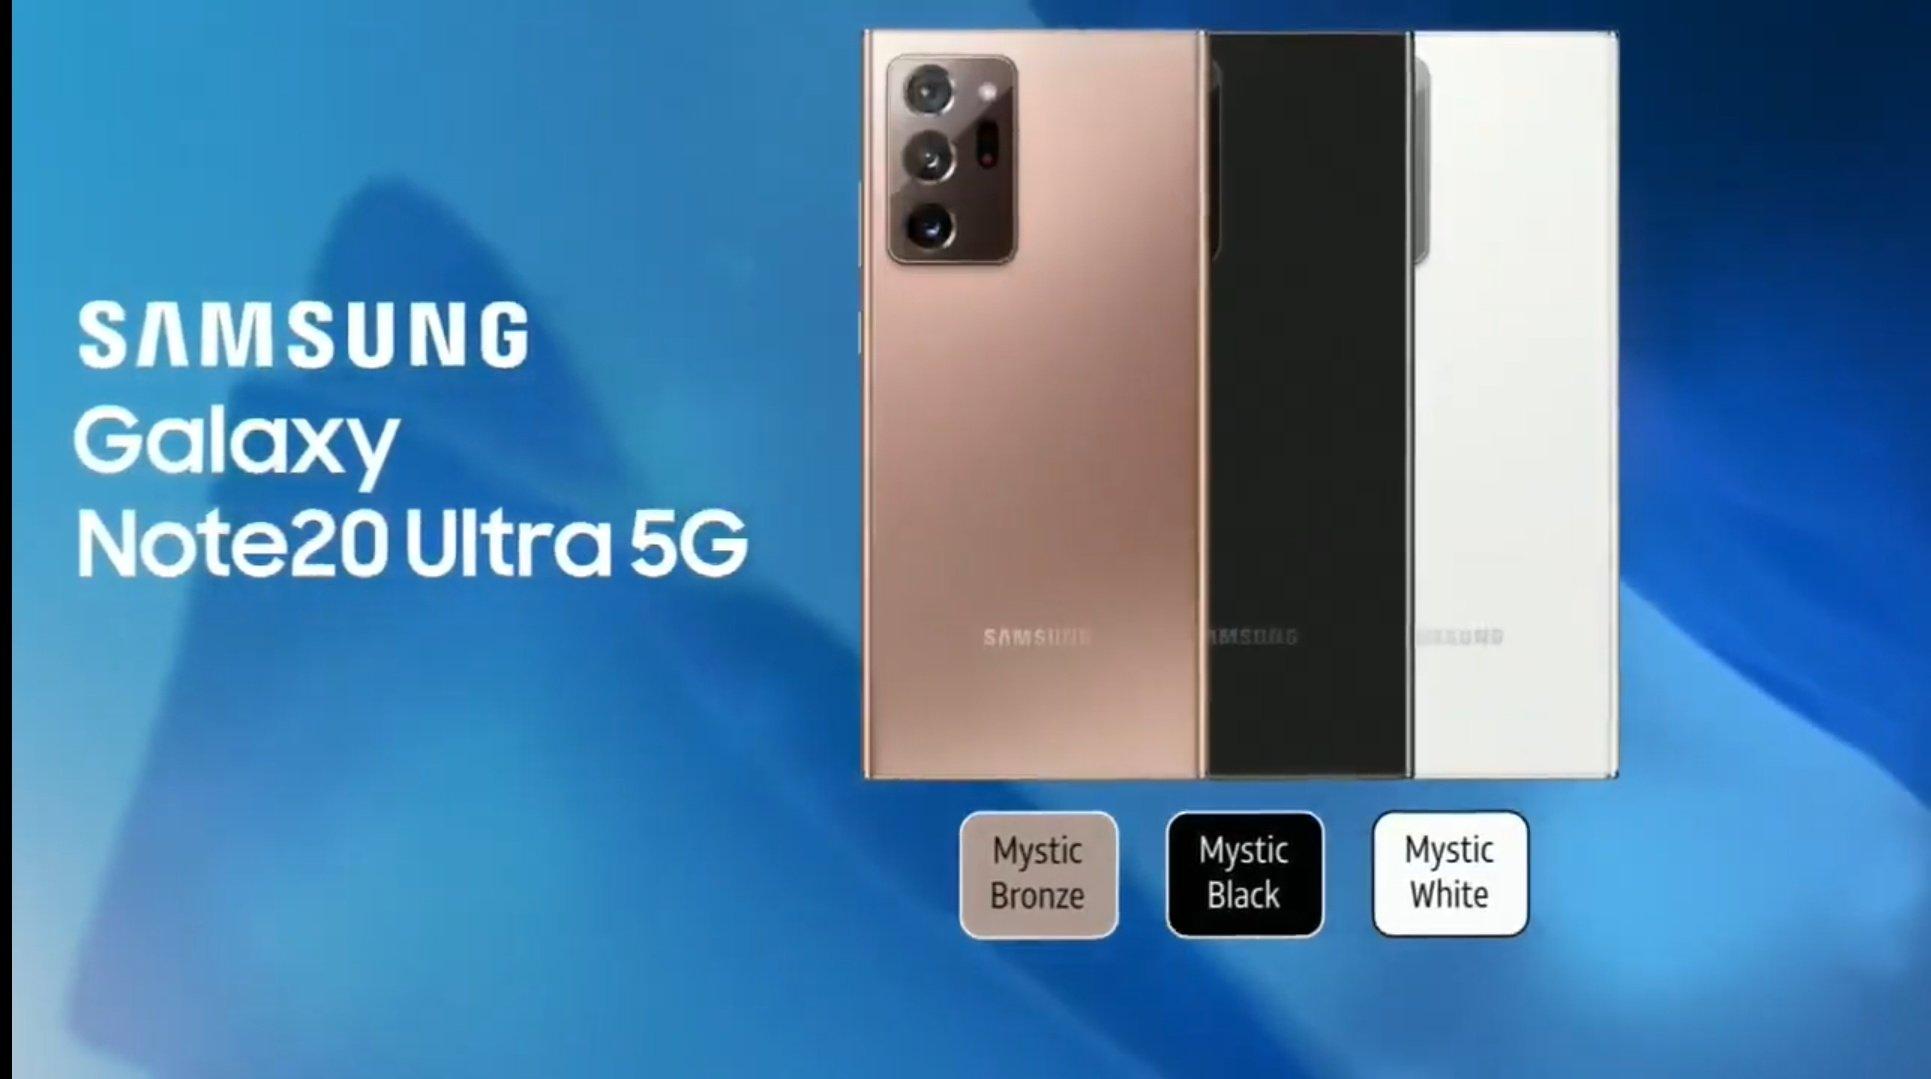 Характеристики экрана Samsung Galaxy Note 20 Samsung  - blizhe_k_lite_chem_k_ultra_20detali_po_ekranu_samsung_galaxy_note__picture6_0